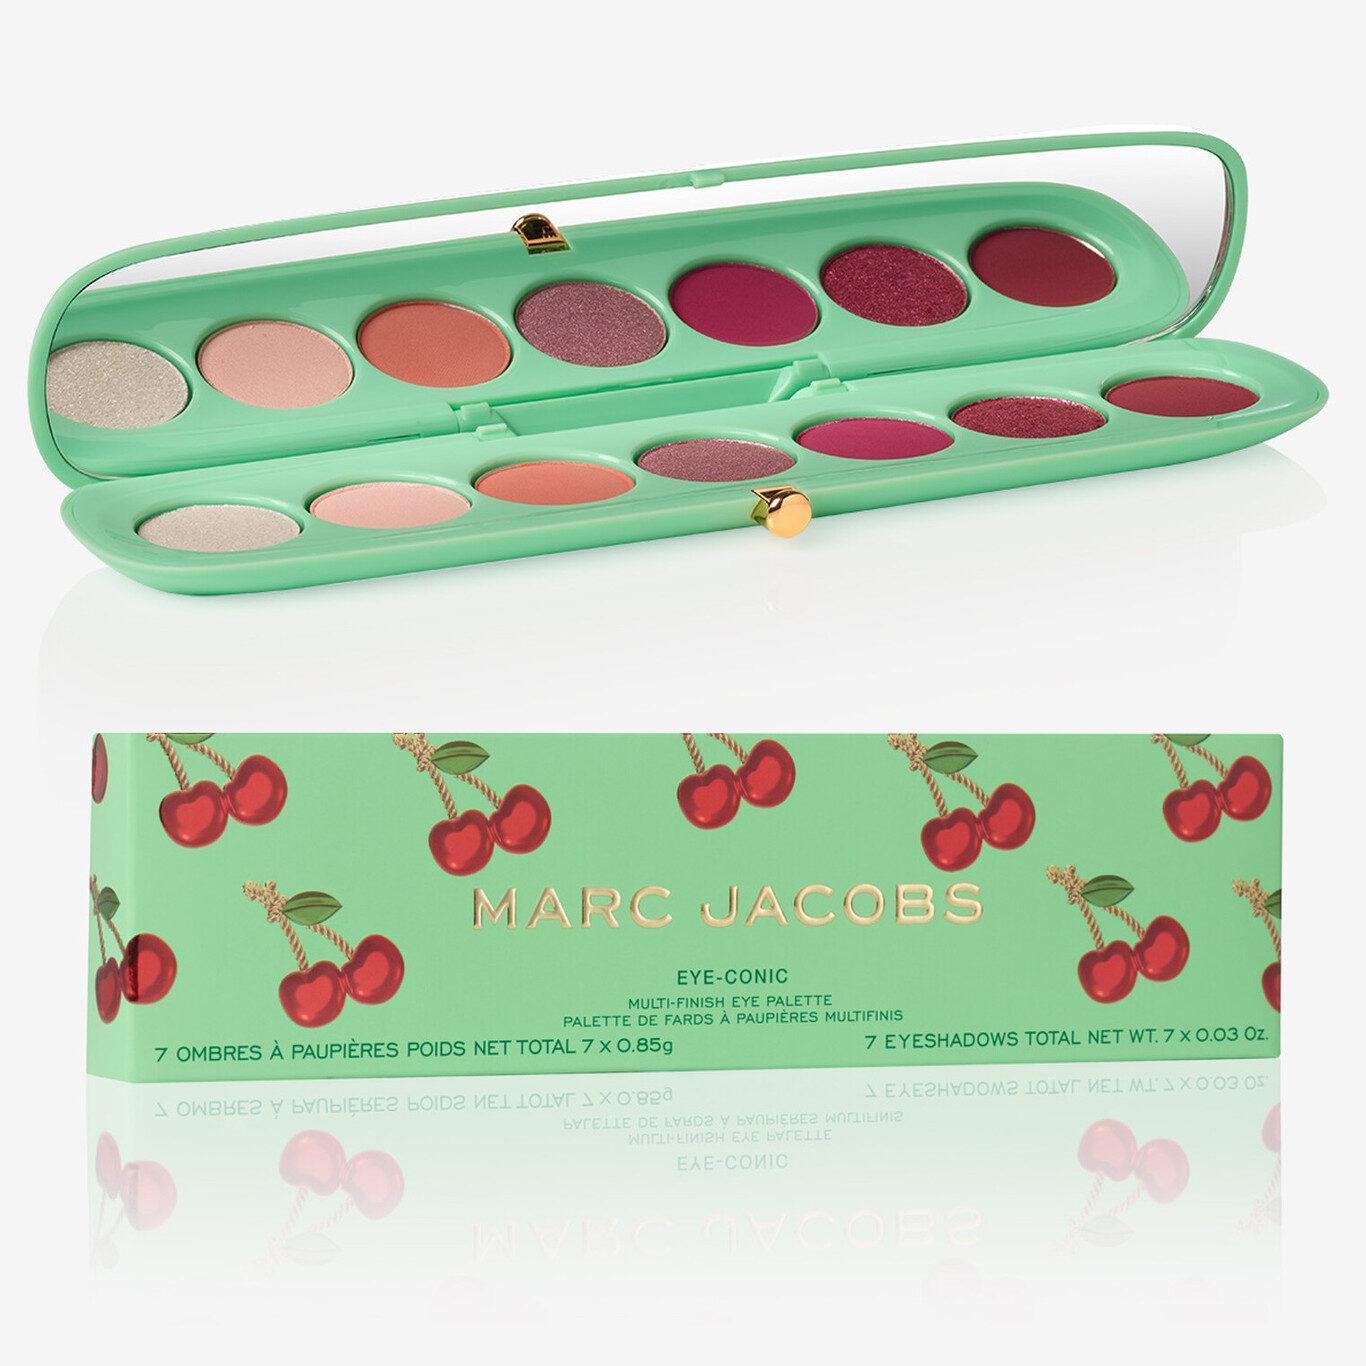 Marc Jacobs Very Merry Cherry Eye Conic Multi Finish Eye Palette Very Merry Cherry Edition Box